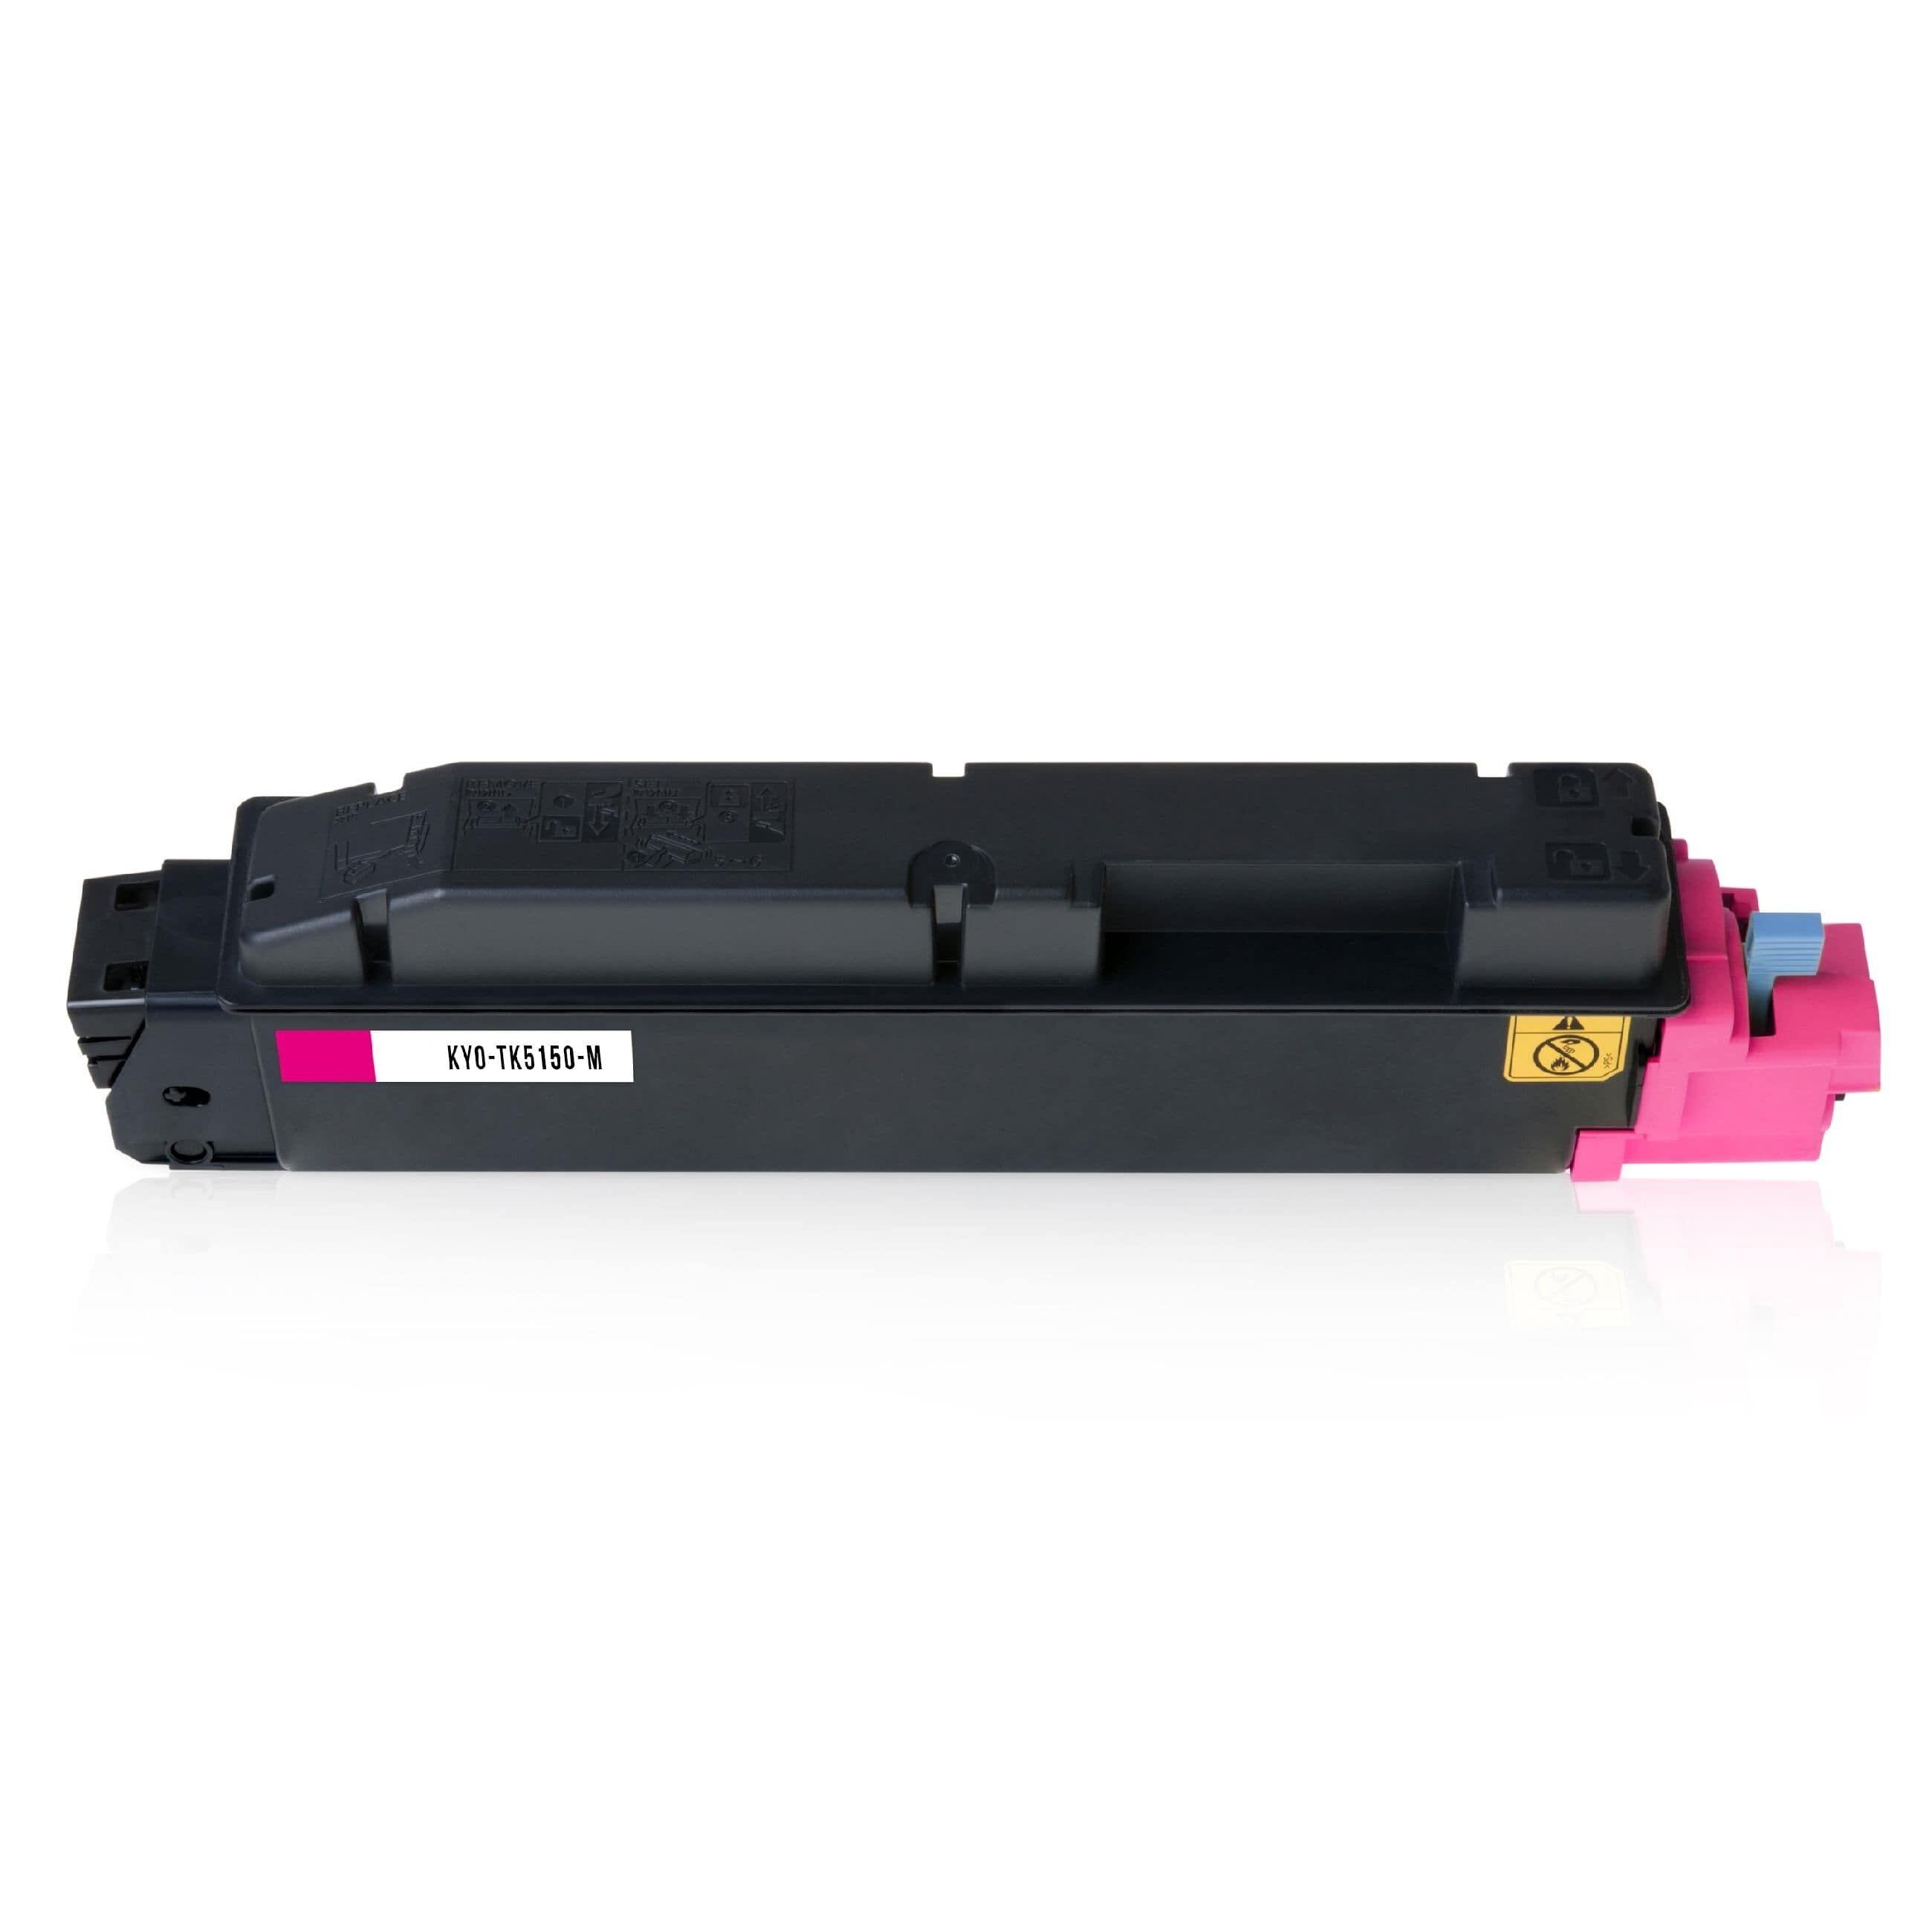 Kyocera Cartouche de Toner pour Kyocera 1T02NSBNL0 / TK-5150 M magenta compatible (de marque ASC)